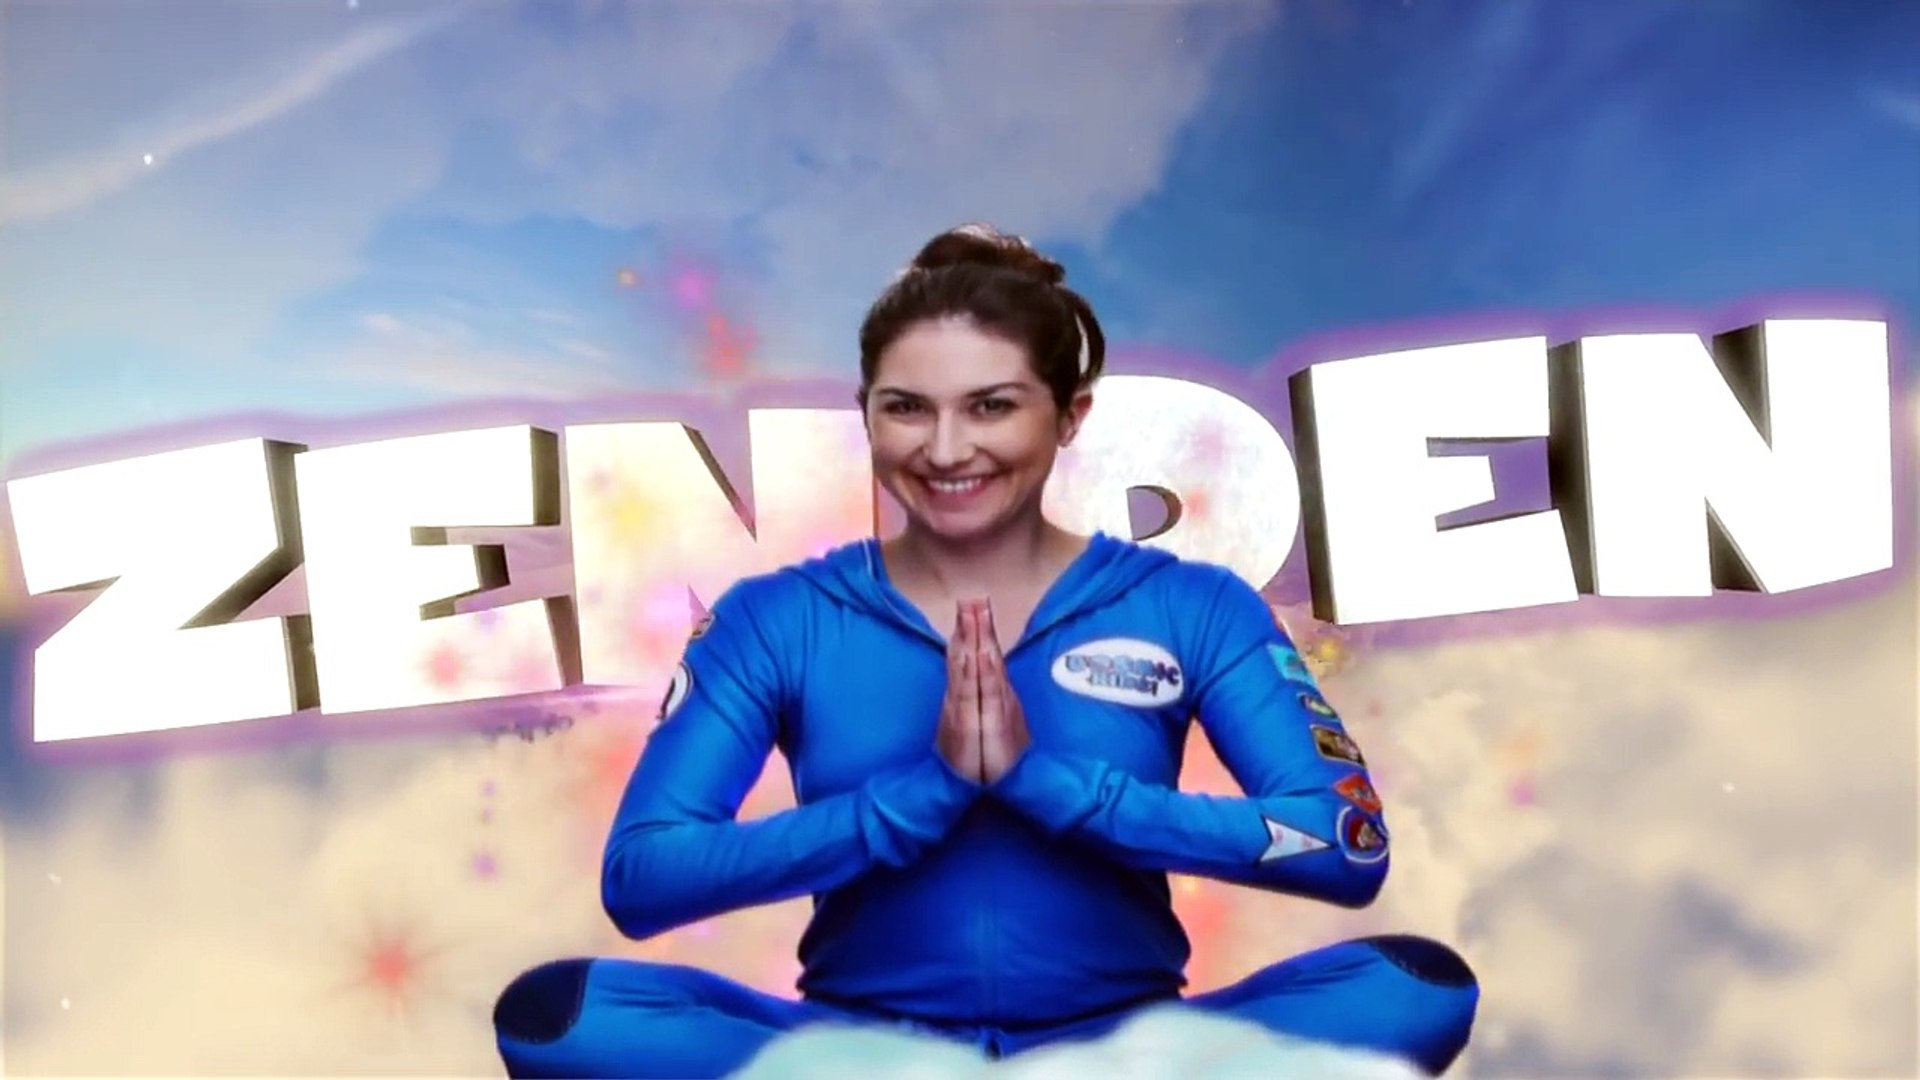 The Bye Bye Boat Cosmic Kids Zen Den Mindfulness For Kids Video Dailymotion